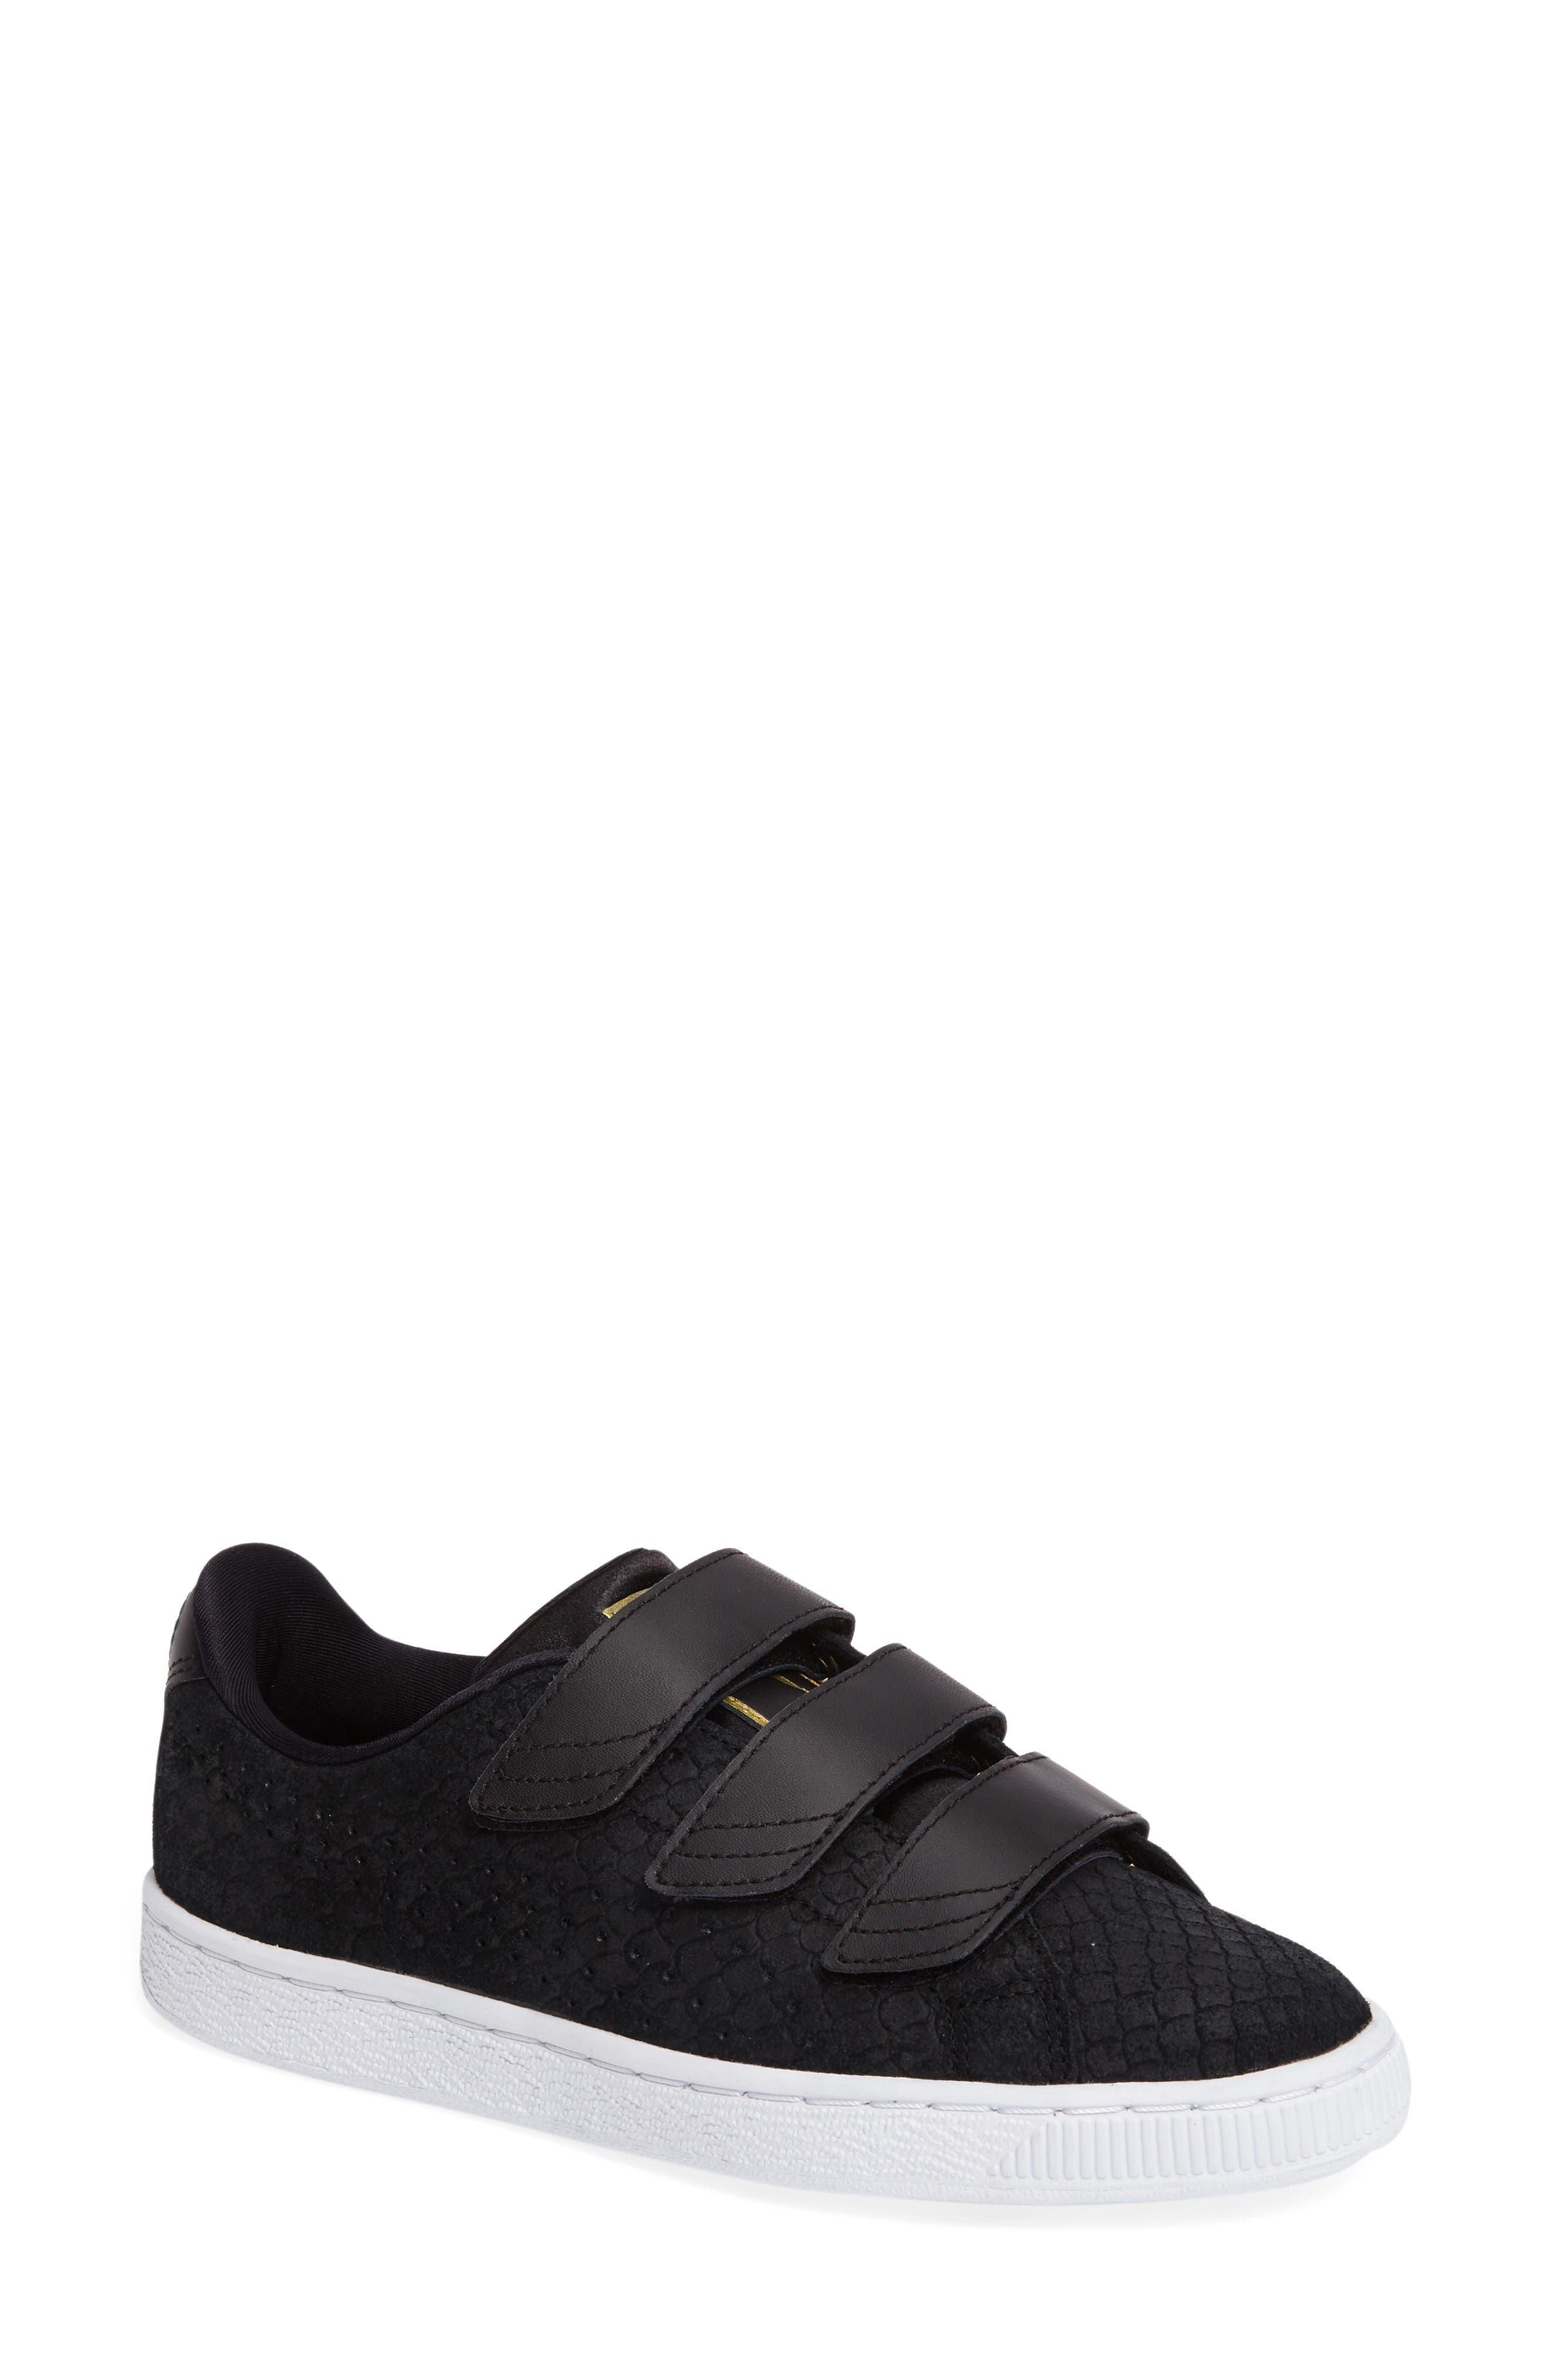 Main Image - PUMA Basket Strap ExoticSkin Sneaker (Women)